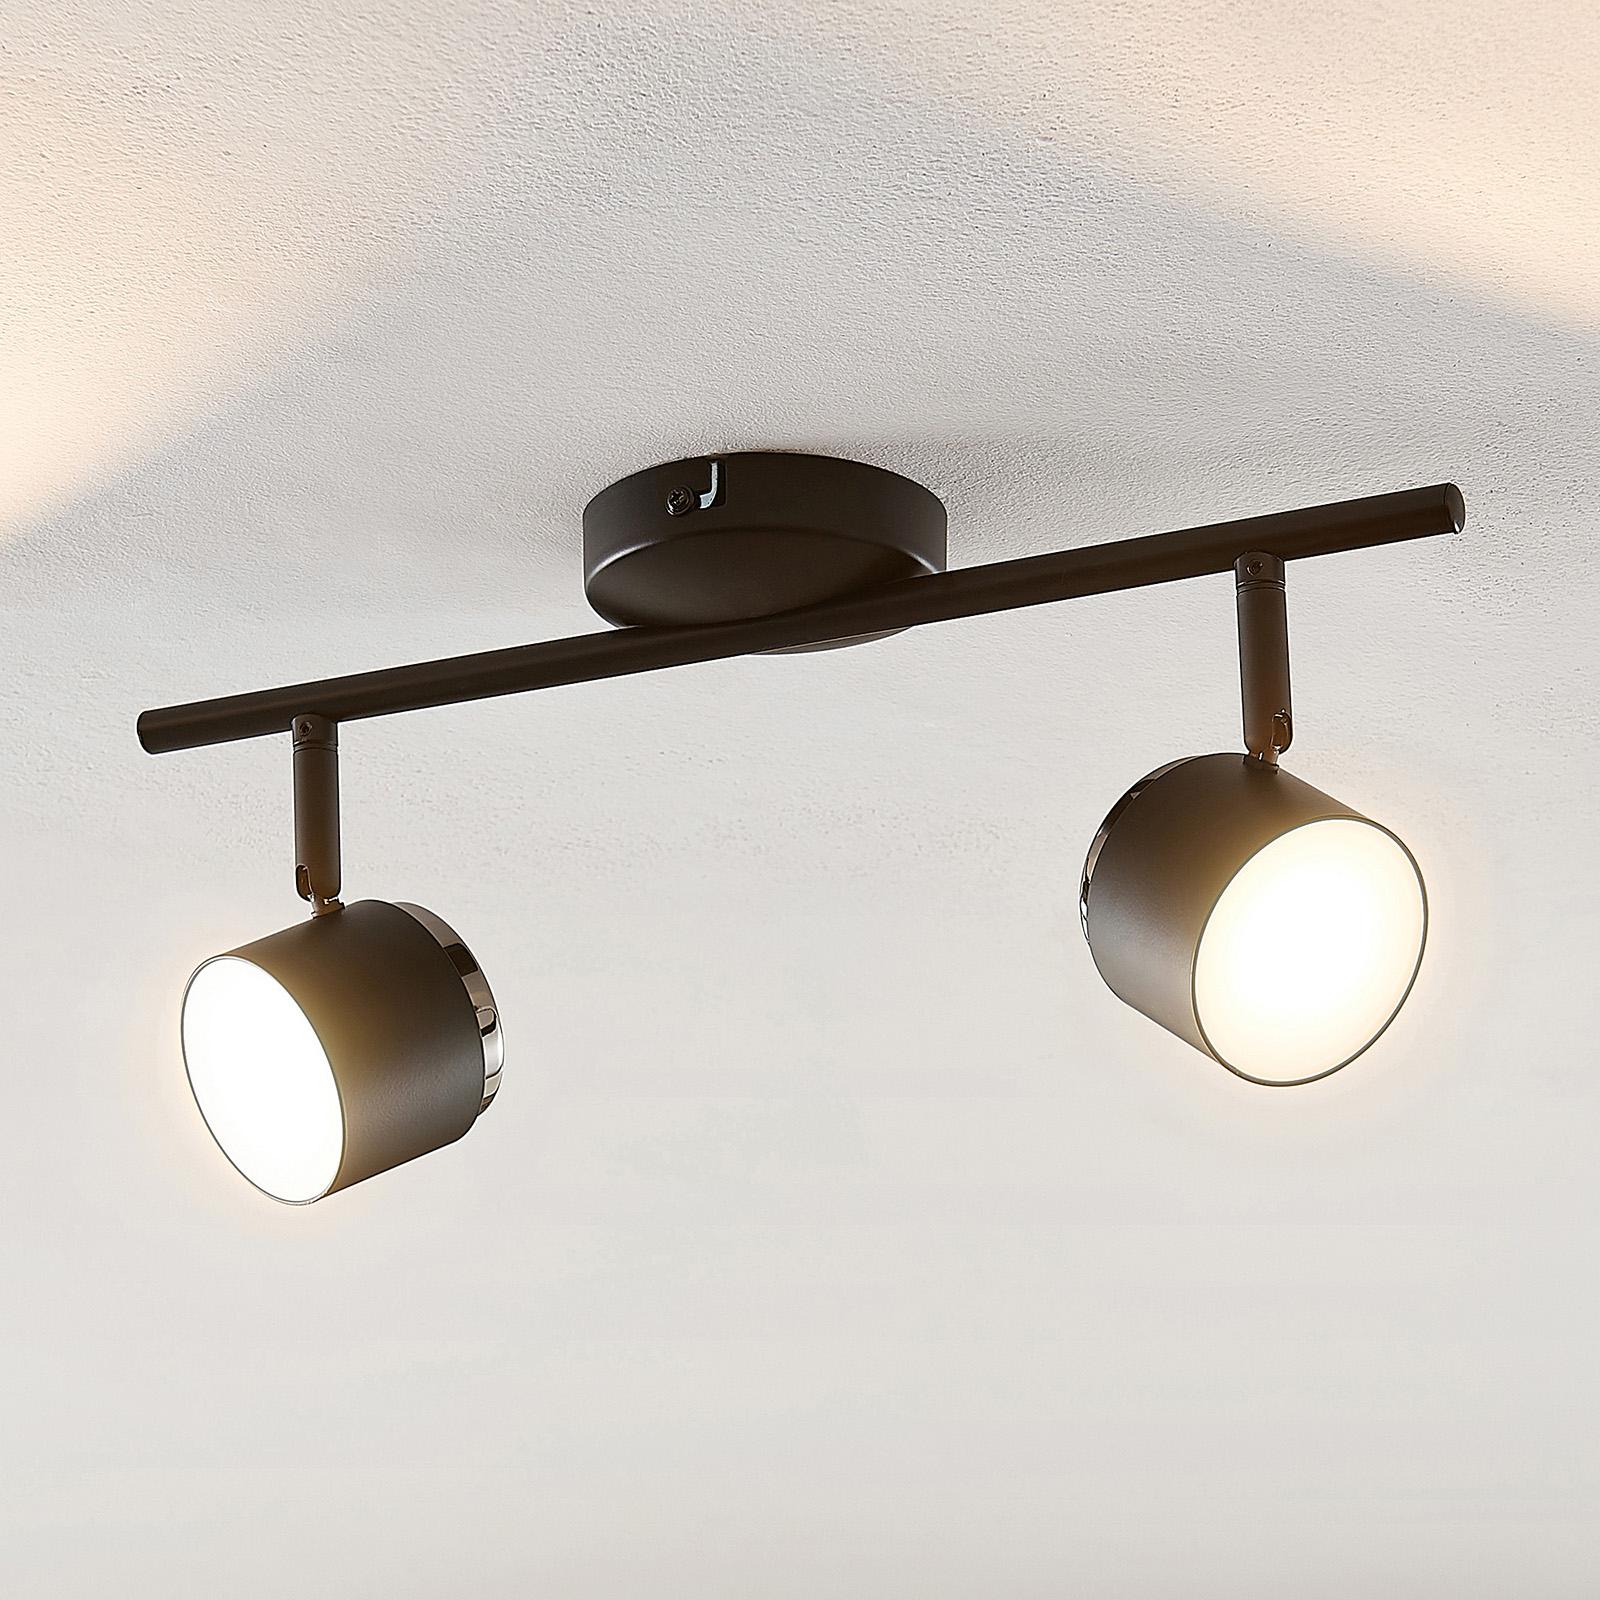 Lindby Marrie LED-Strahler, schwarz, 2-fl., Stange